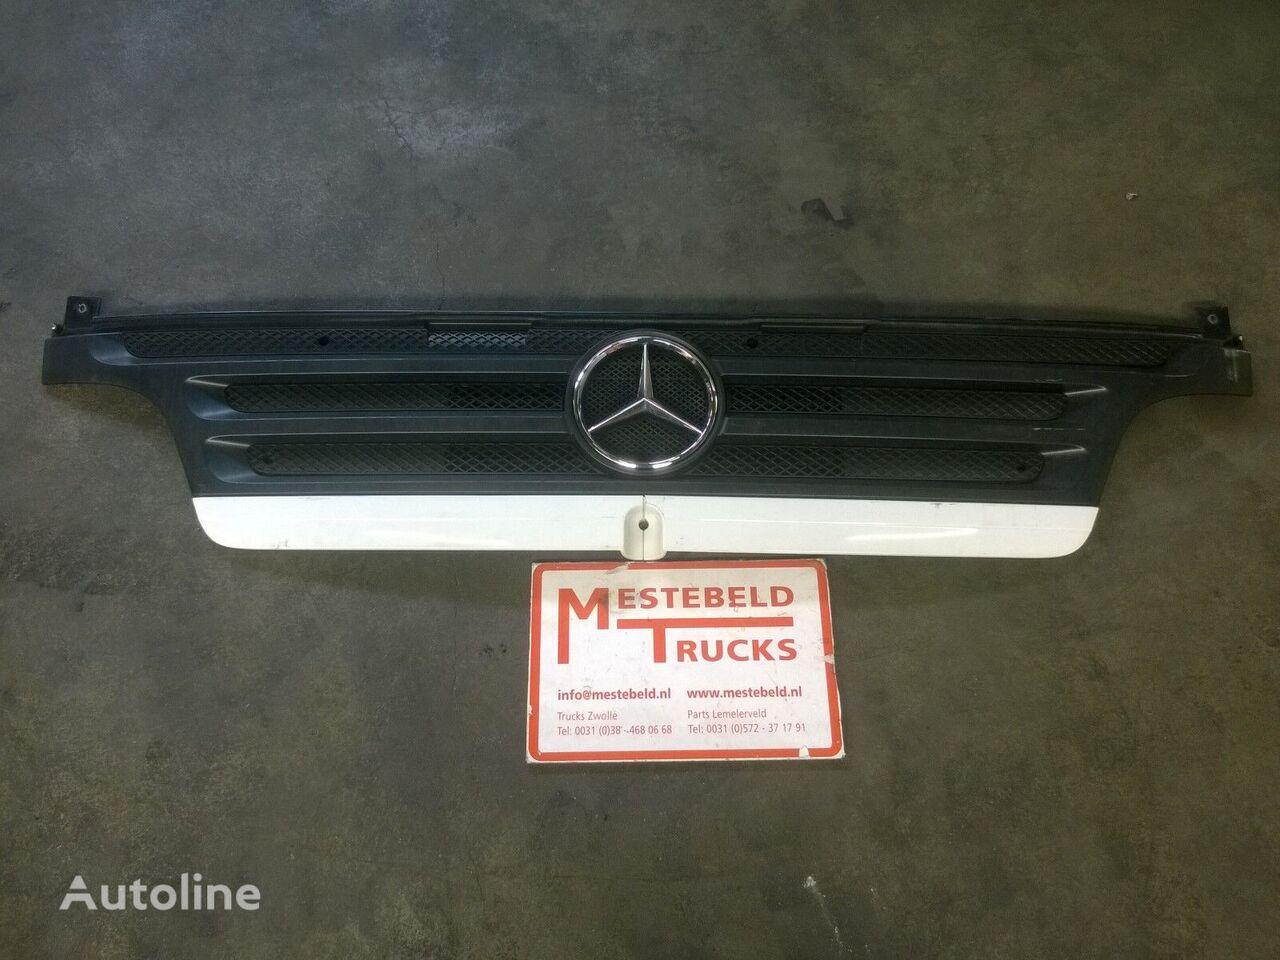 решетка радиатора MERCEDES-BENZ Grille для грузовика MERCEDES-BENZ Atego